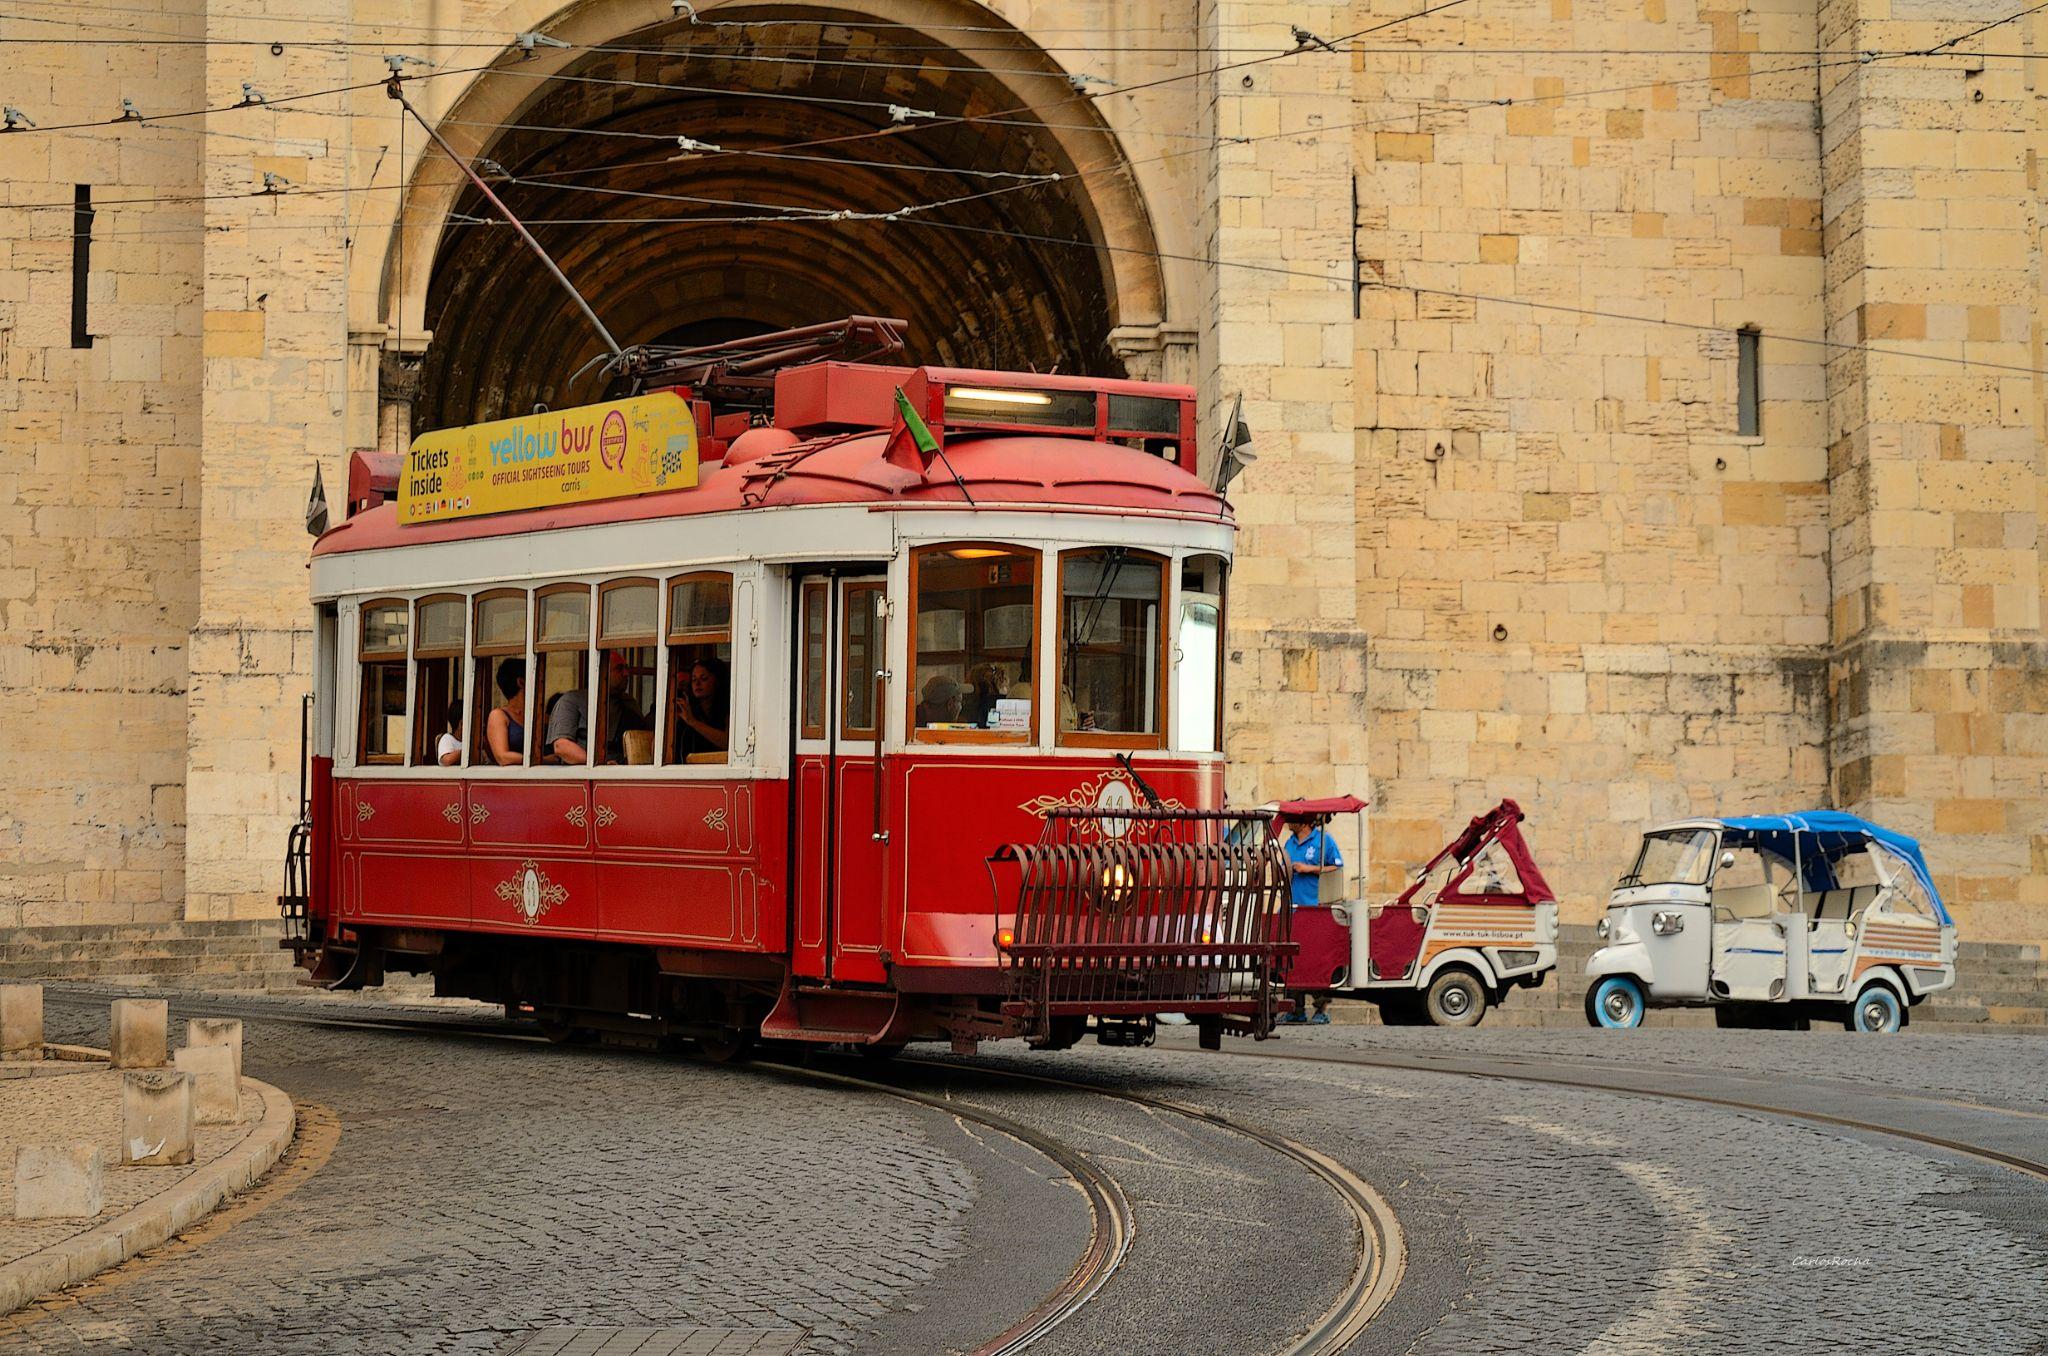 Carreira 28 Lisboa by carlosfiuzar